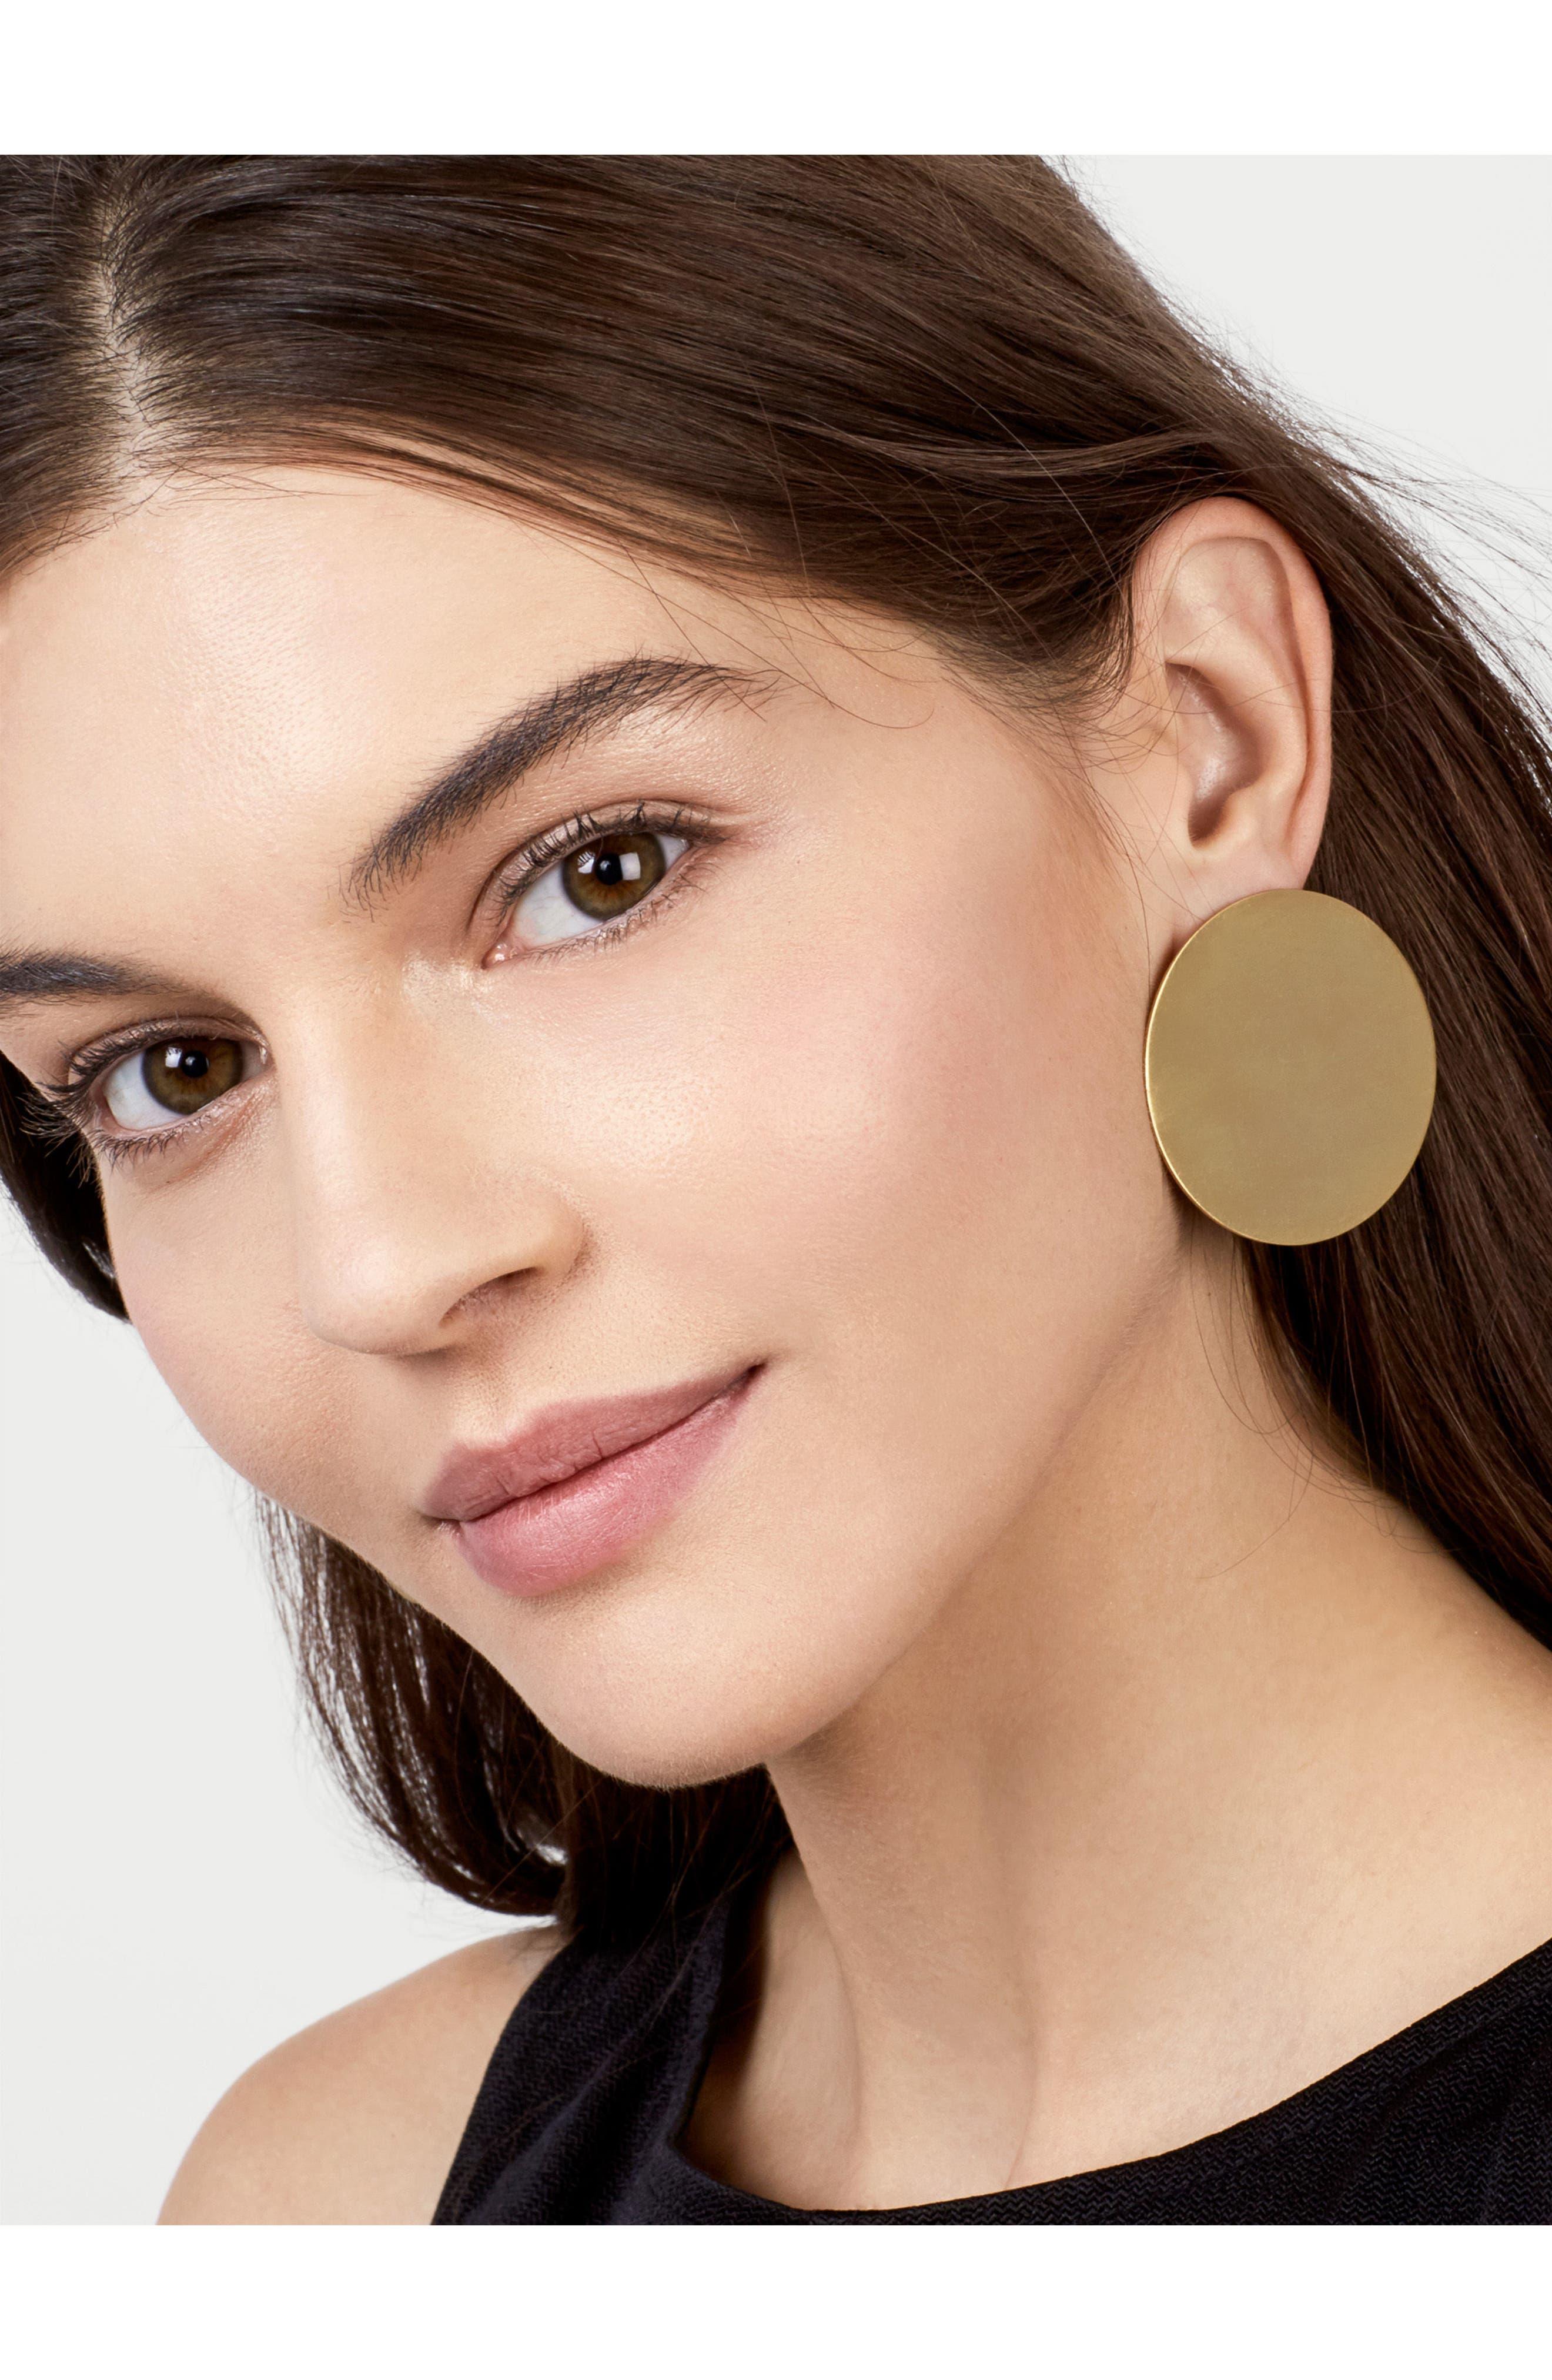 Cora Disk Stud Earrings,                             Alternate thumbnail 2, color,                             710